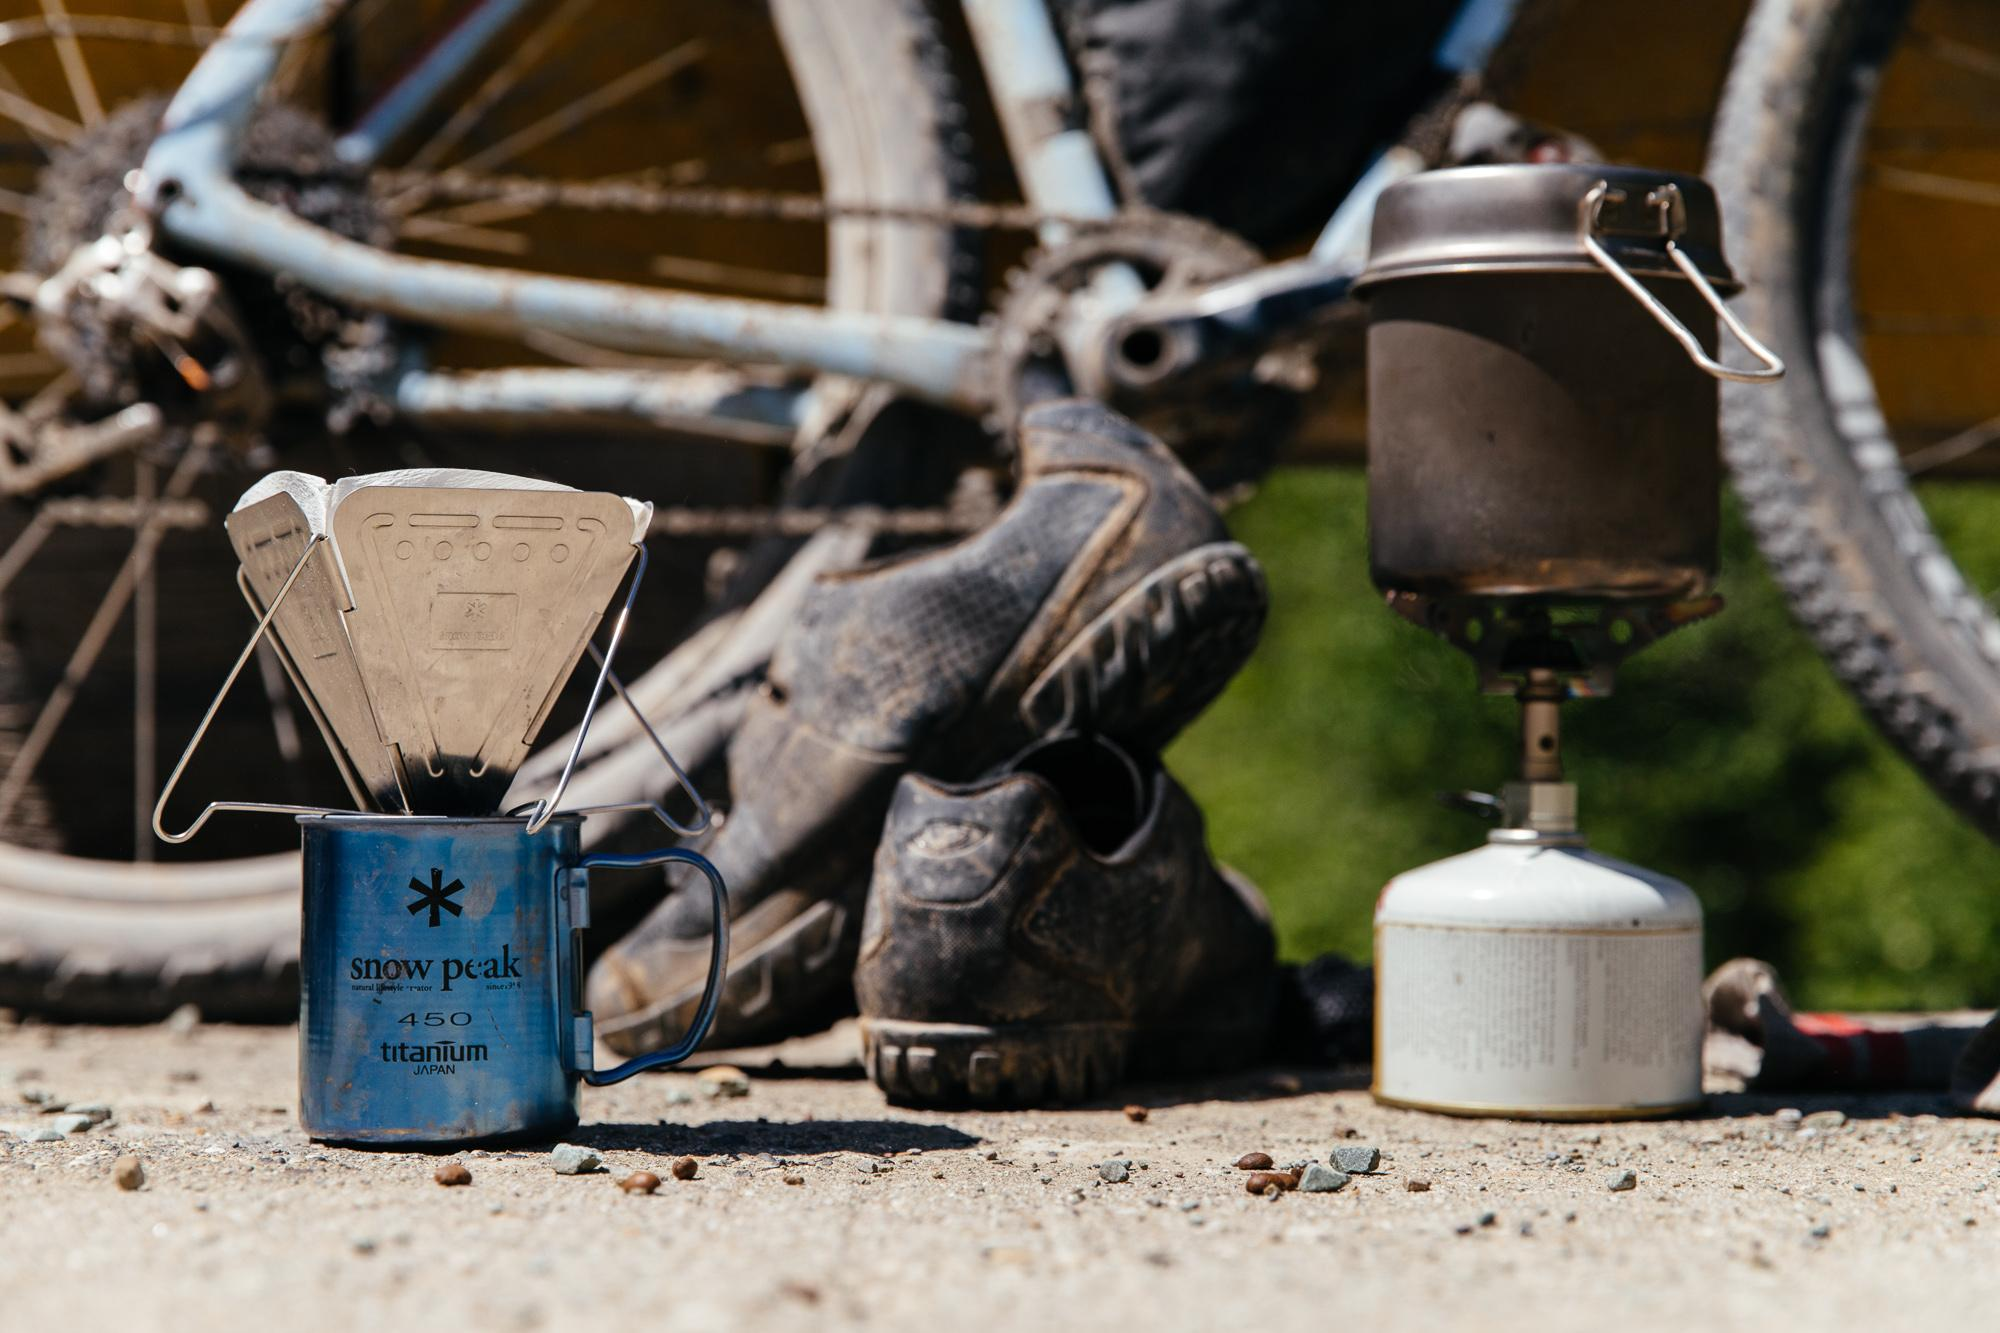 Roadside coffee